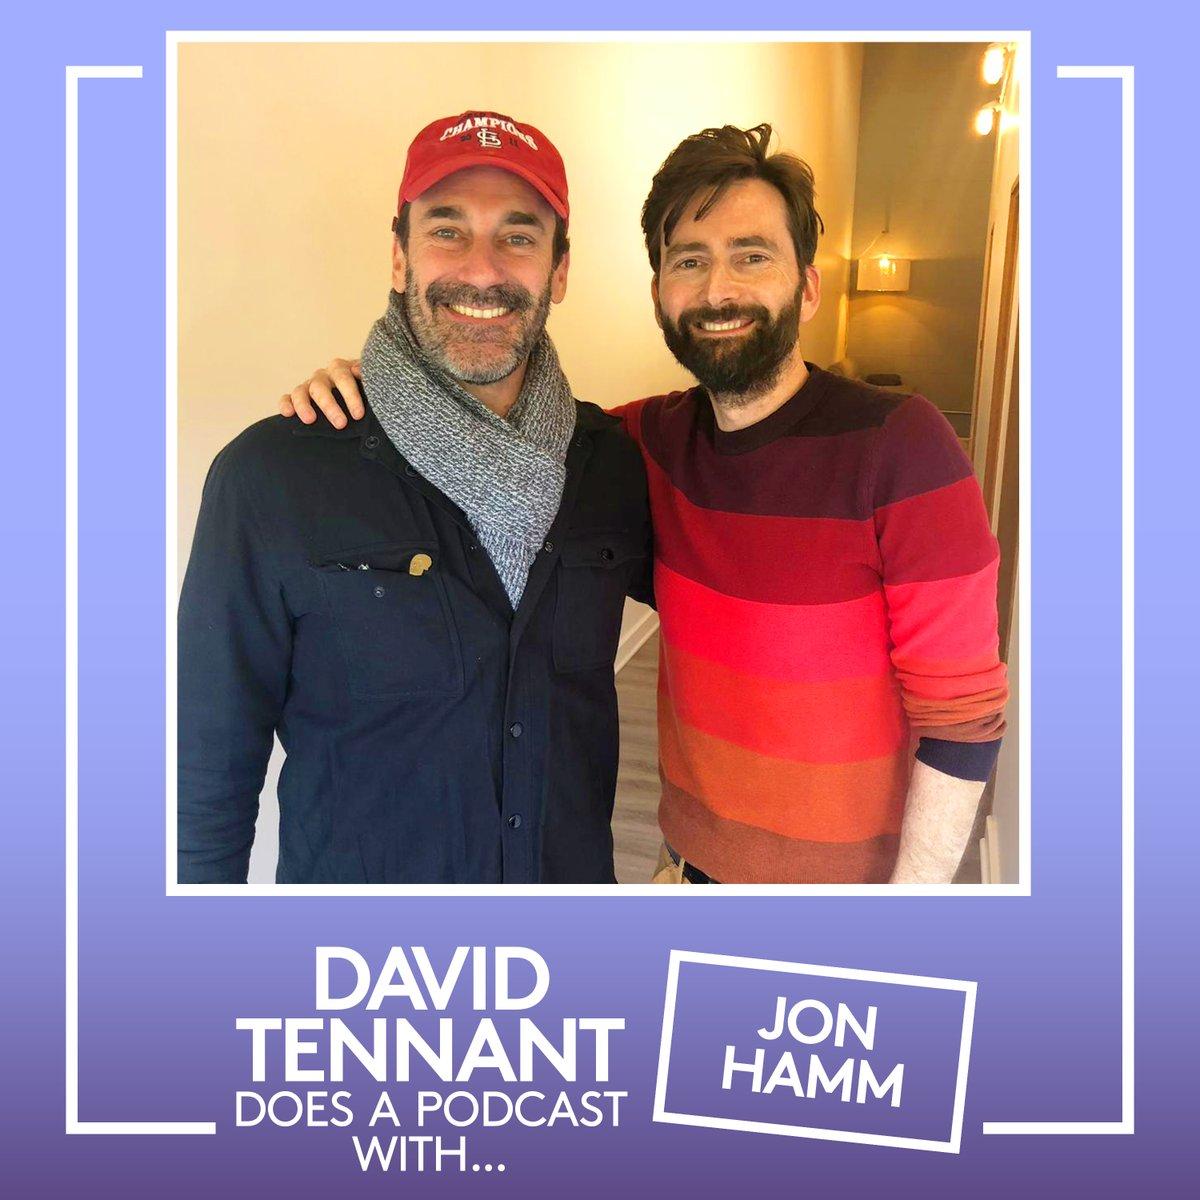 David Tennant with Jon Hamm